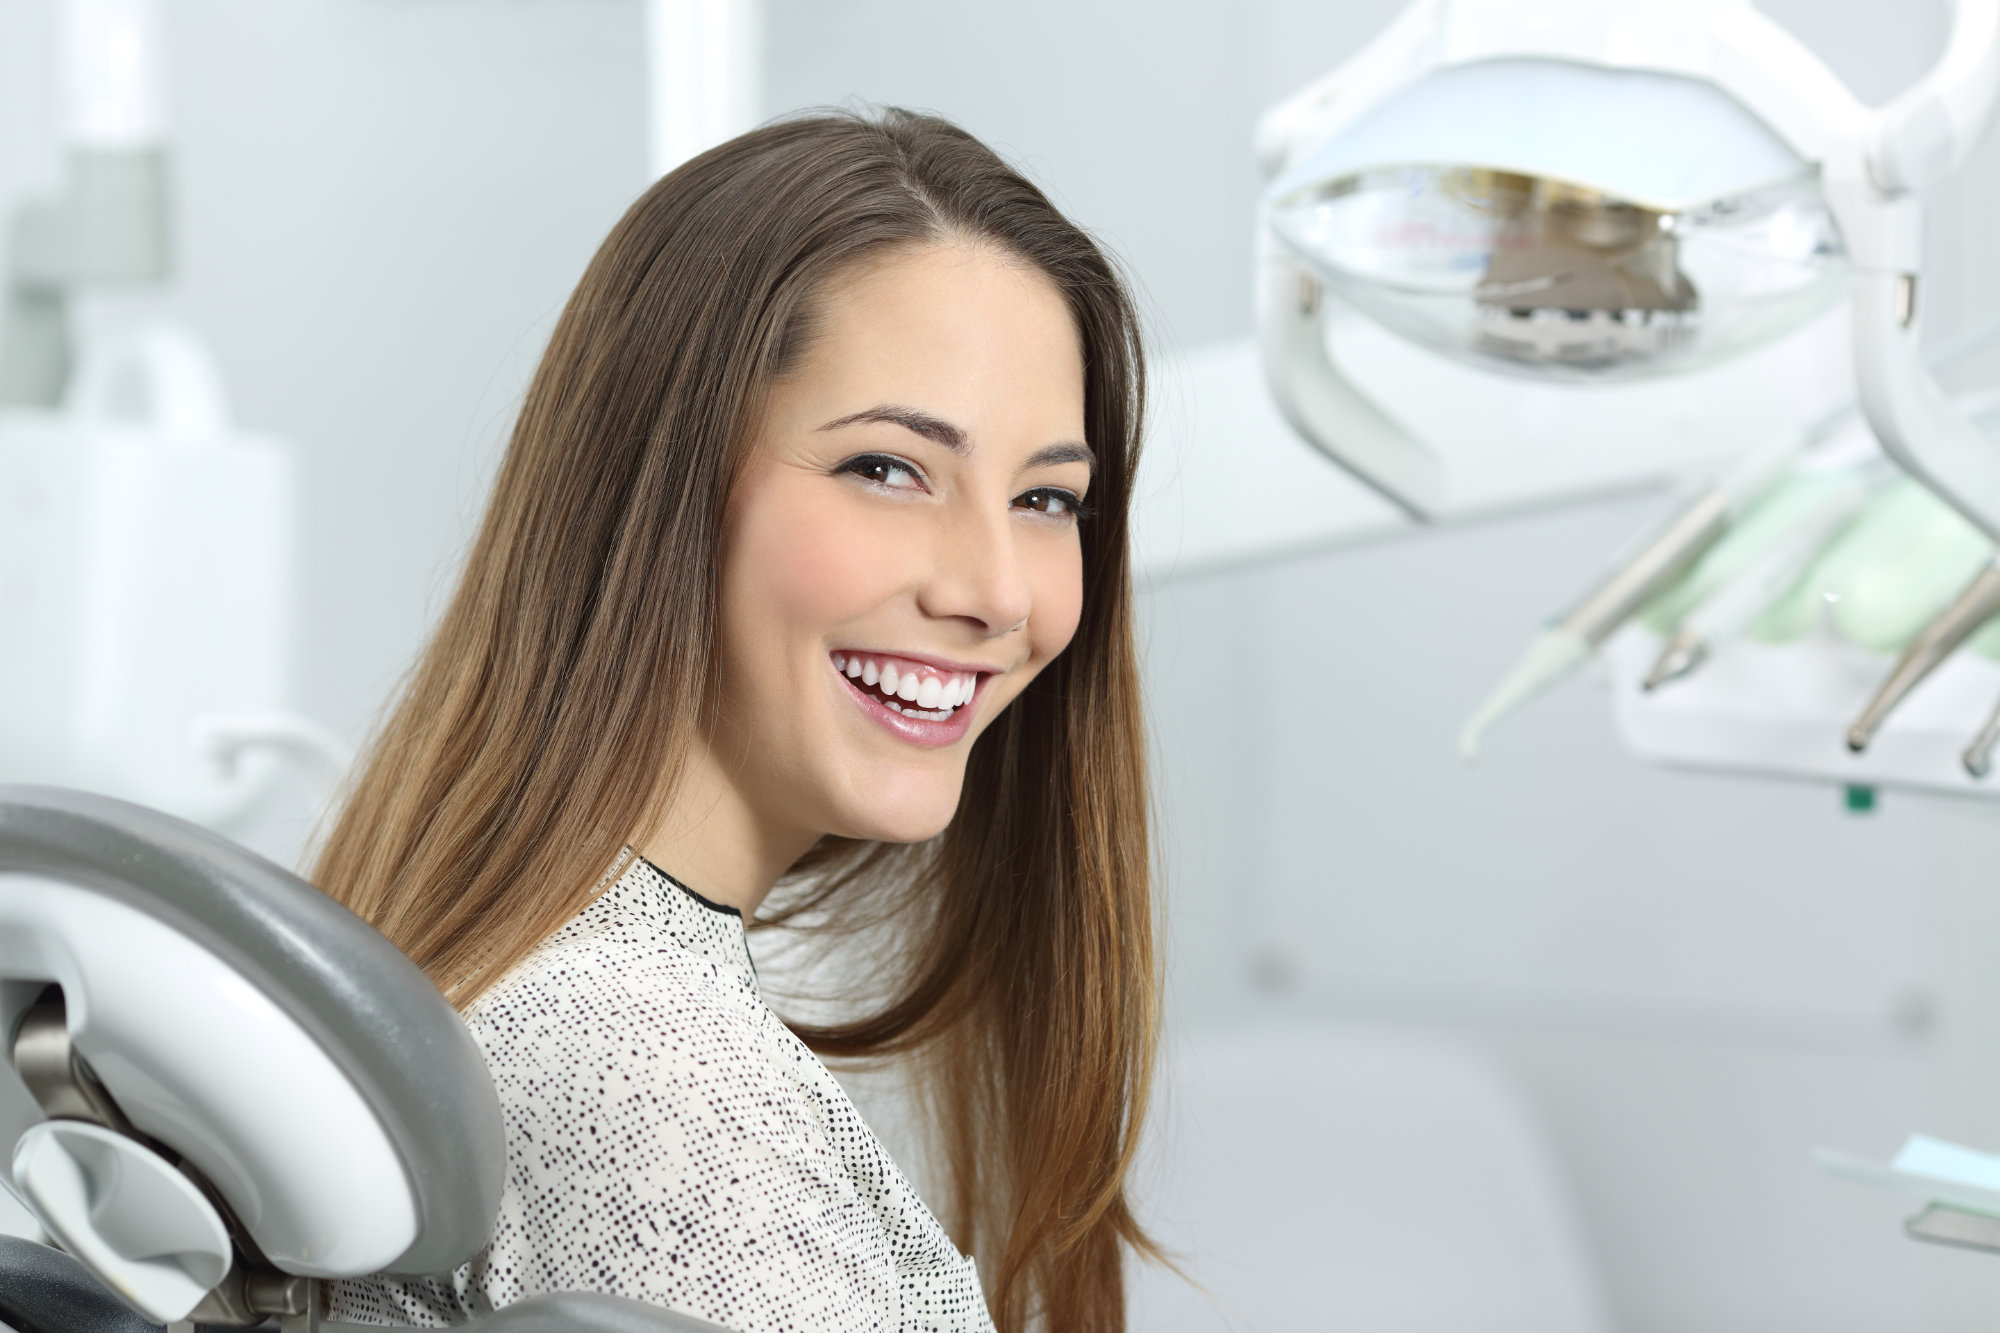 dental examination, dental chair, dental room, dental fillings, dental implants, teeth whitening